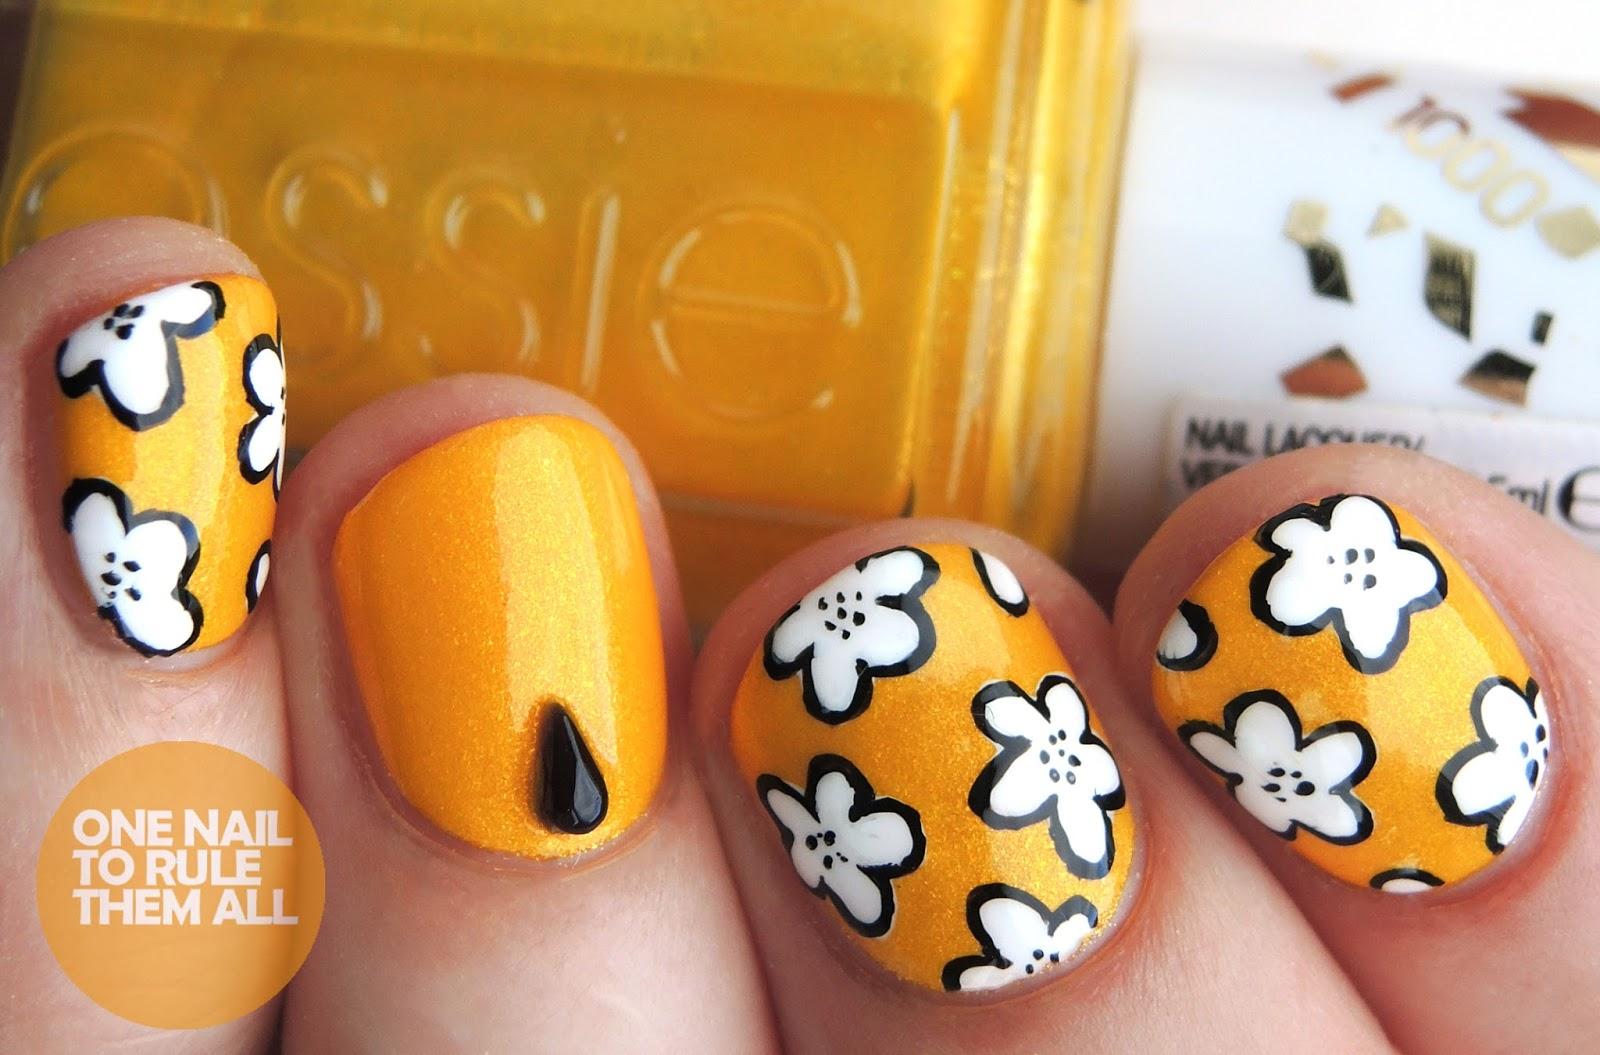 Essie Yellow Nail Polish Amazon - CrossfitHPU